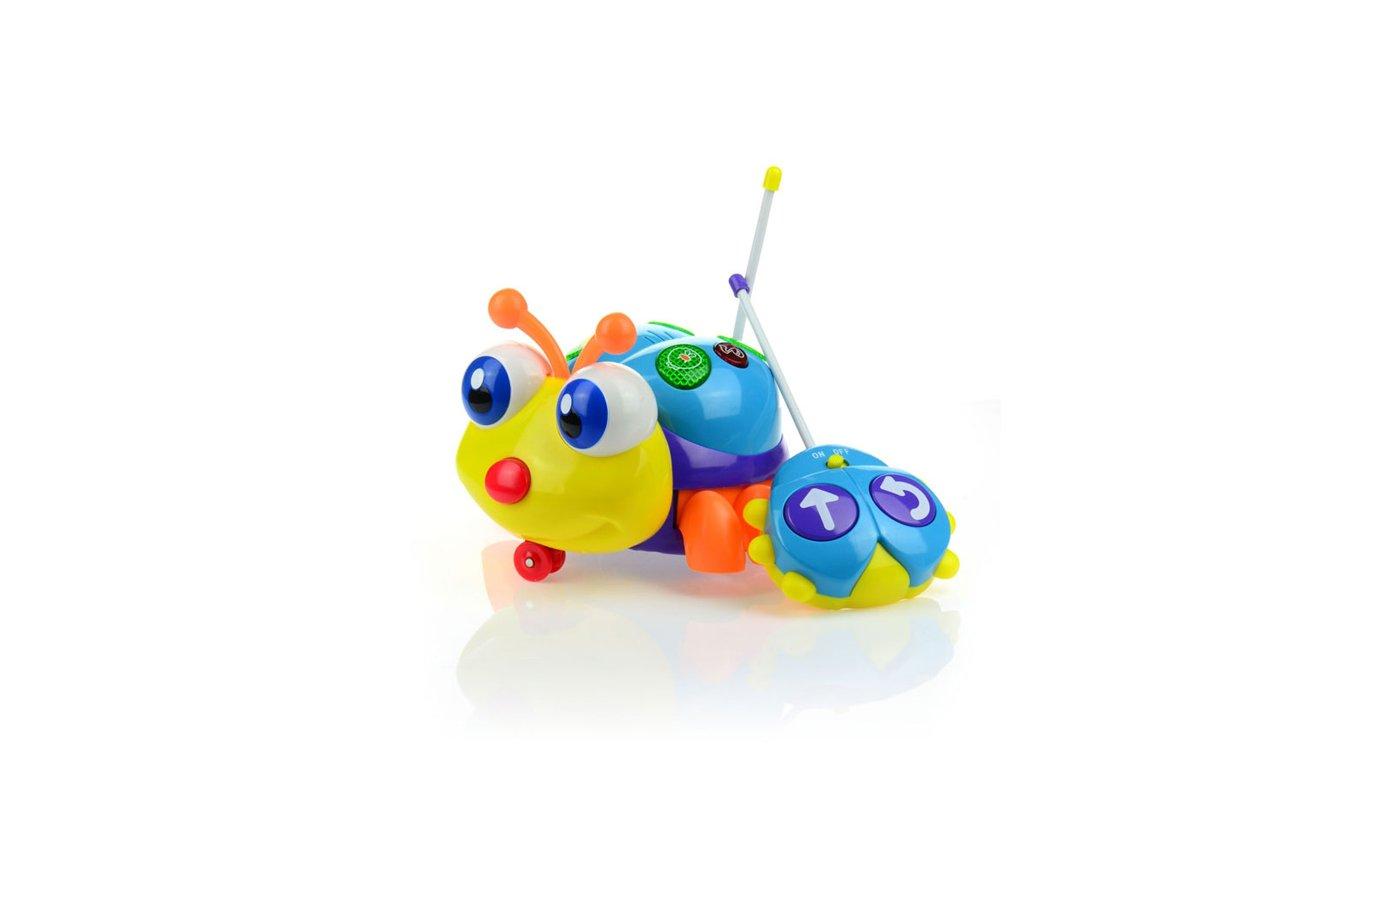 Игрушка Малышарики MSH0303-023 Солнечный жучок